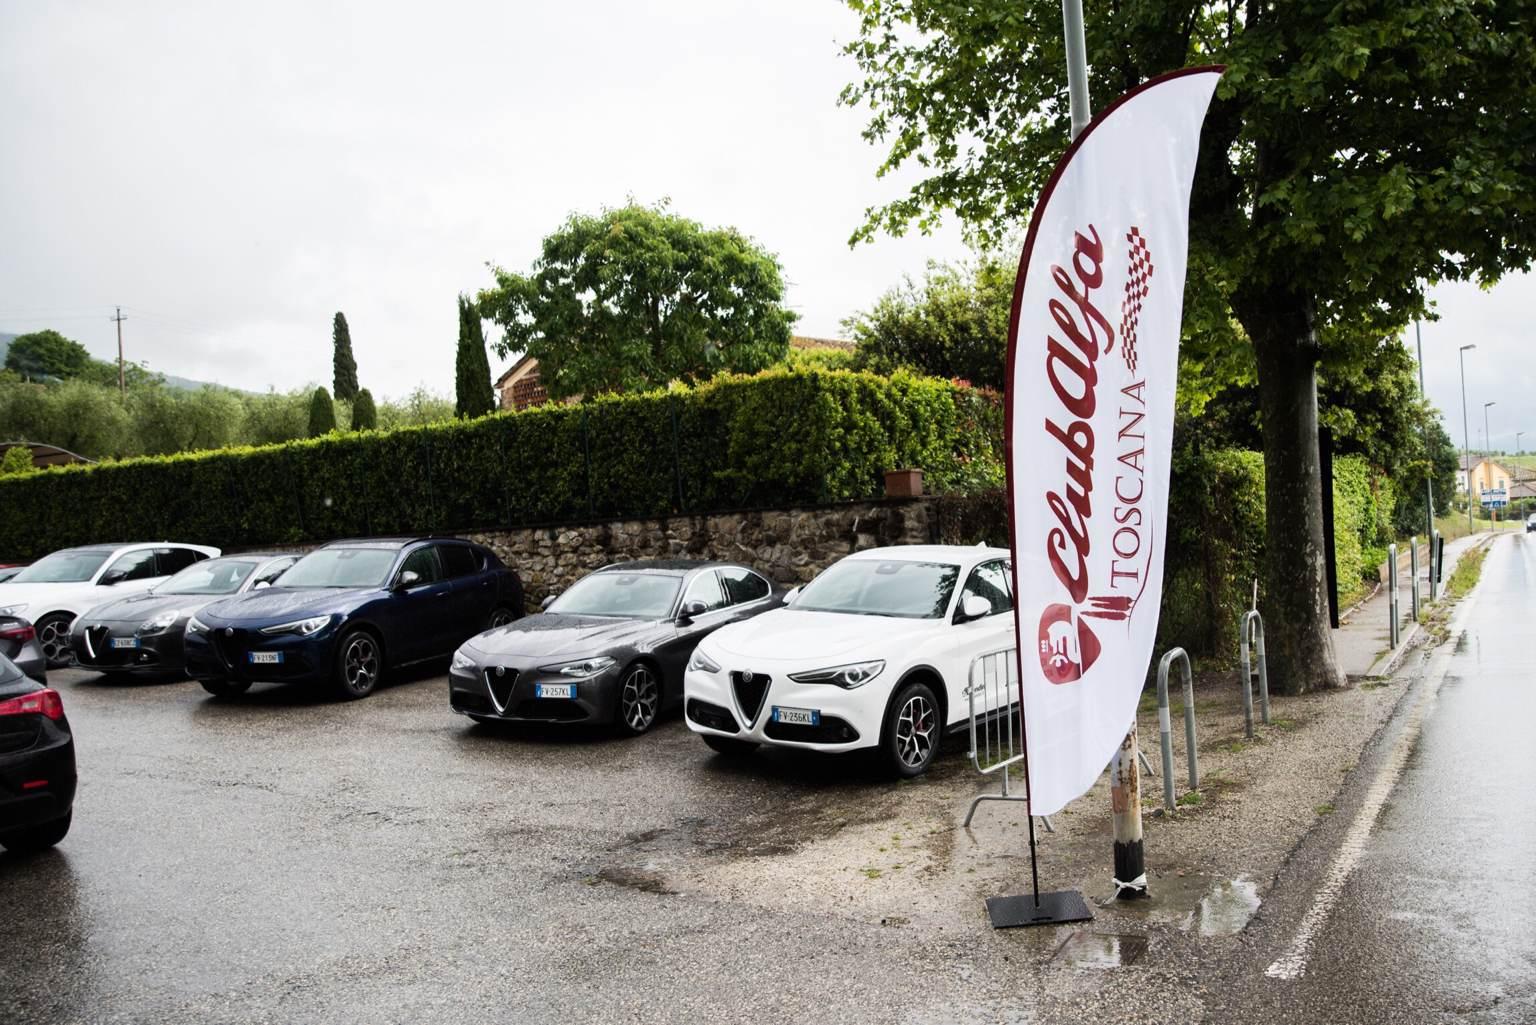 foto Raduno Alfa Romeo & Ferrari a Pistoia - 3